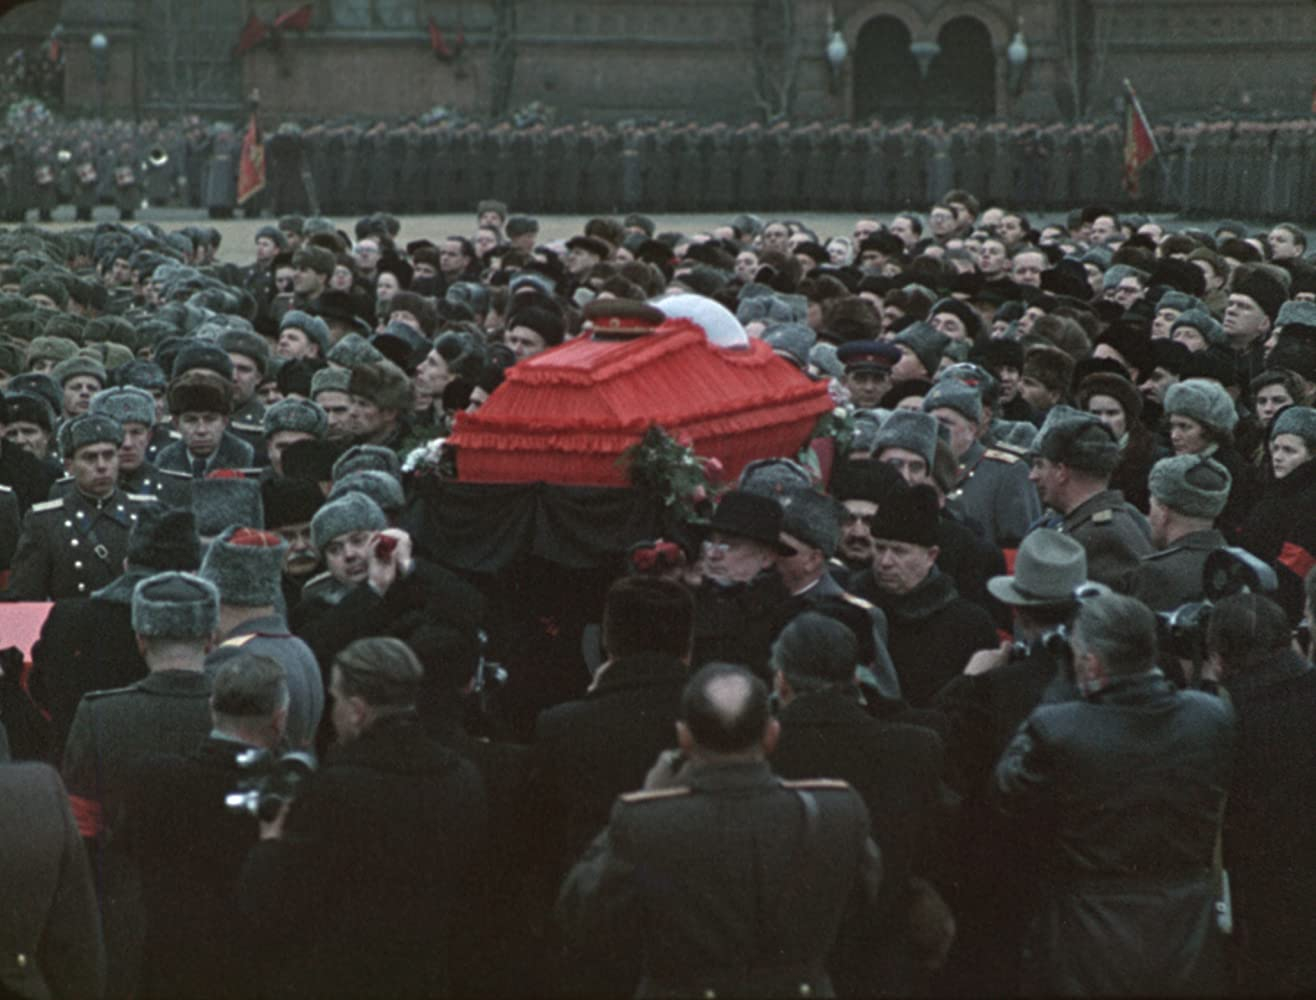 State funeral dirigida por Sergei Loznitsa